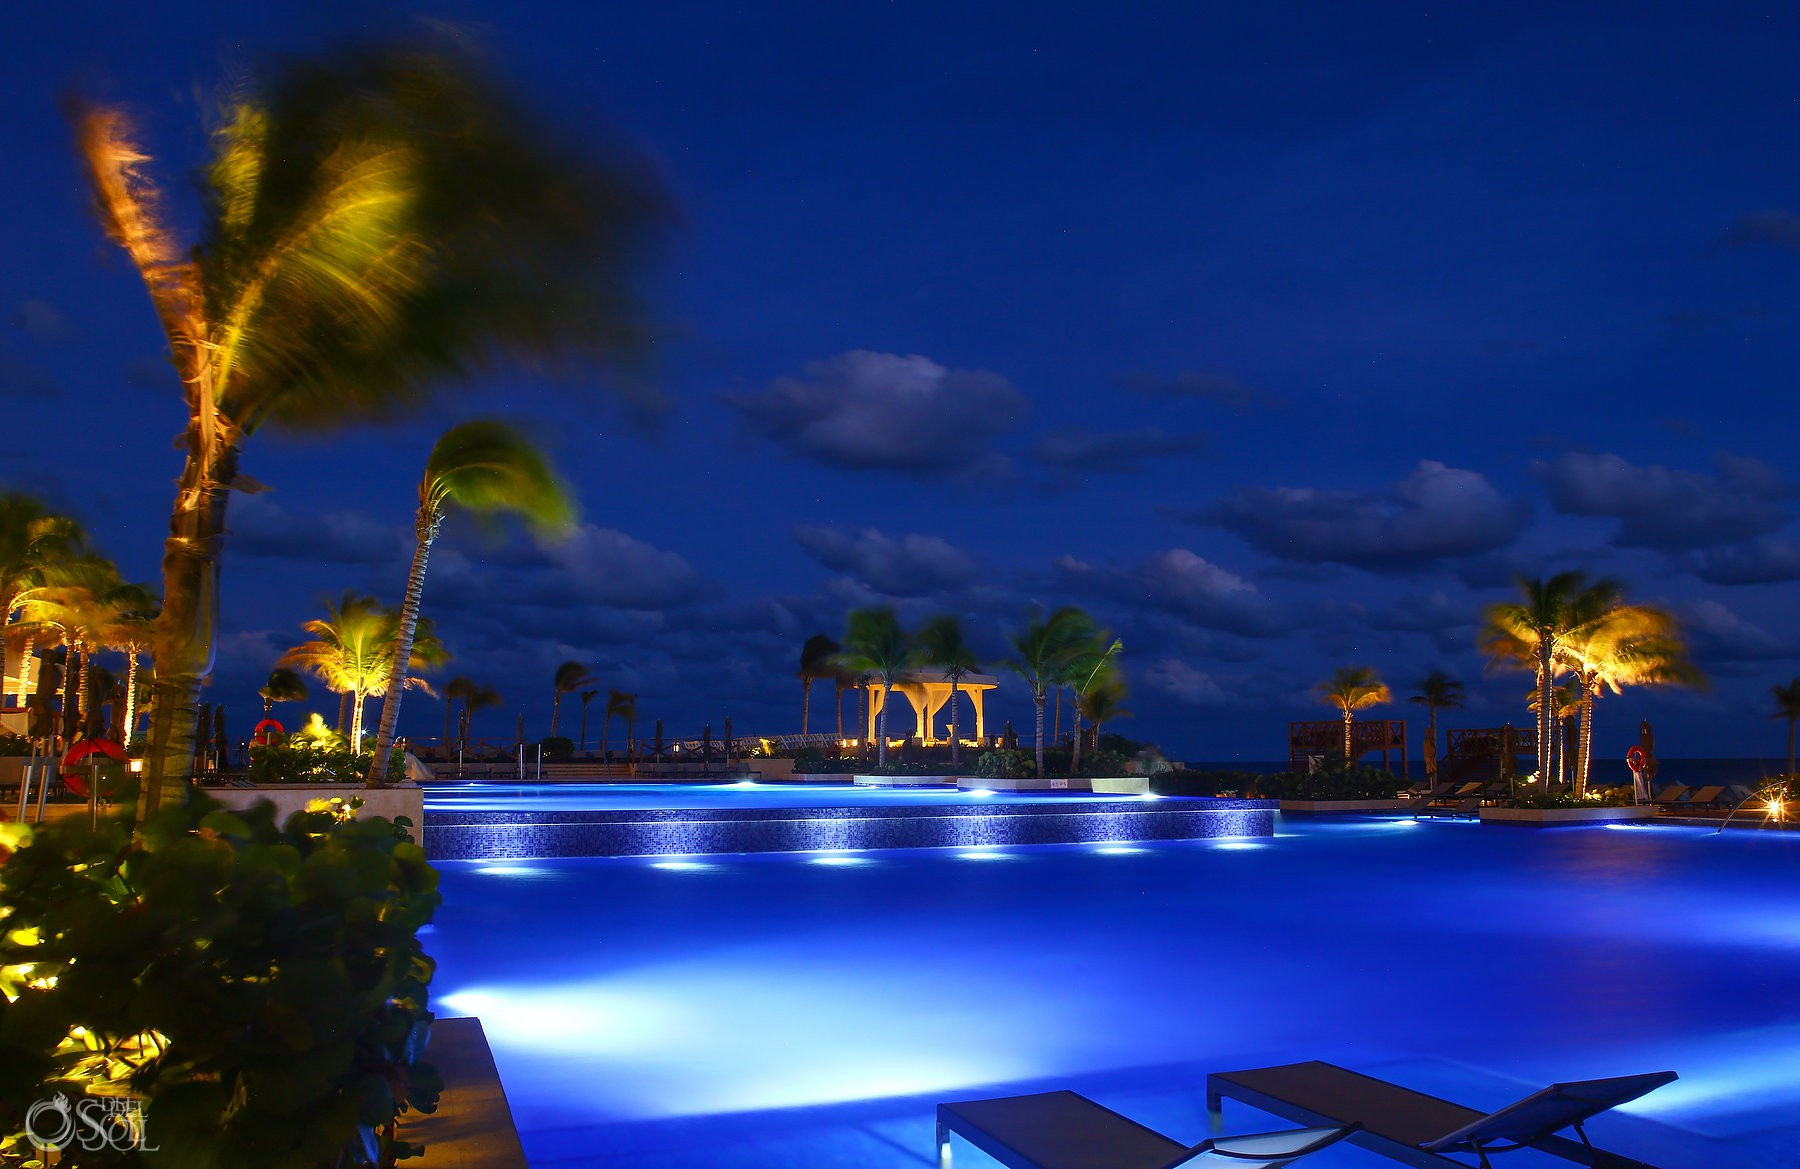 Hyatt ziva cancun pools at night Luxury destination wedding venue